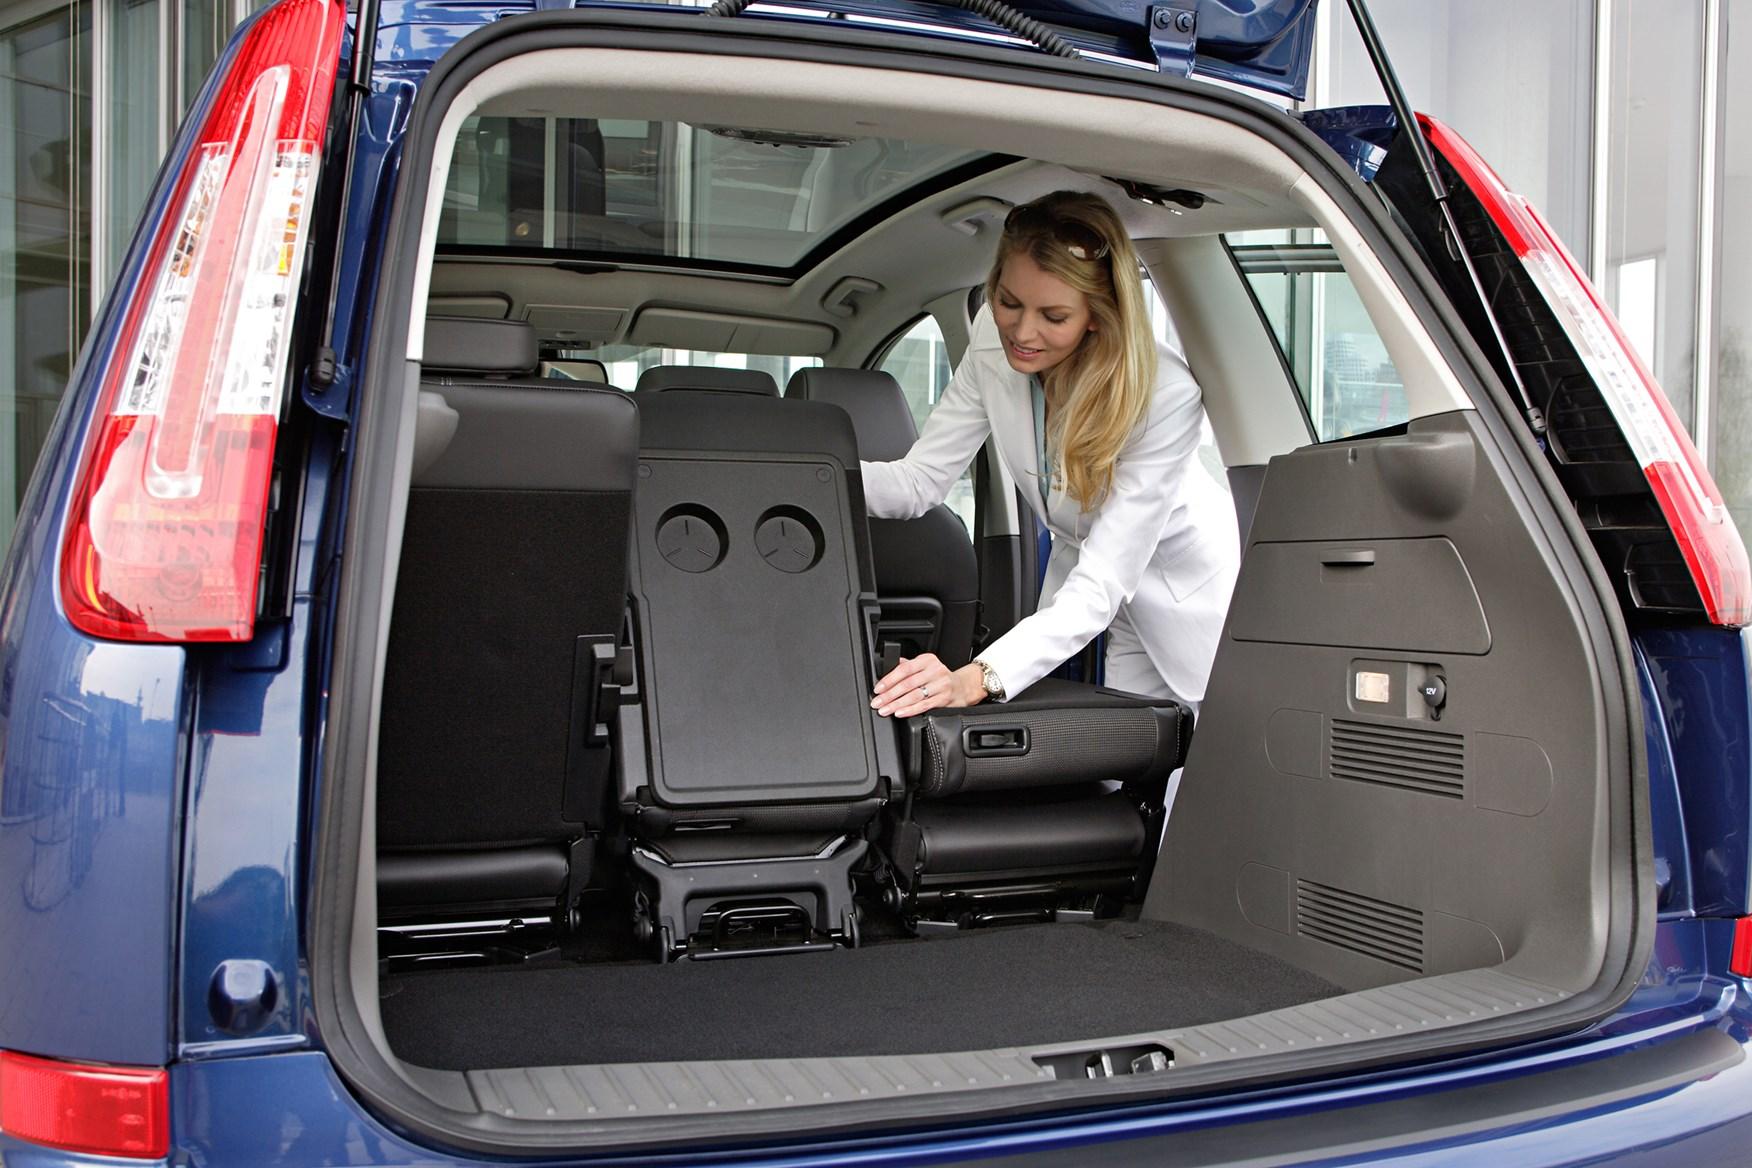 Ford Focus C MAX Estate 2003 2010 Features Equipment and